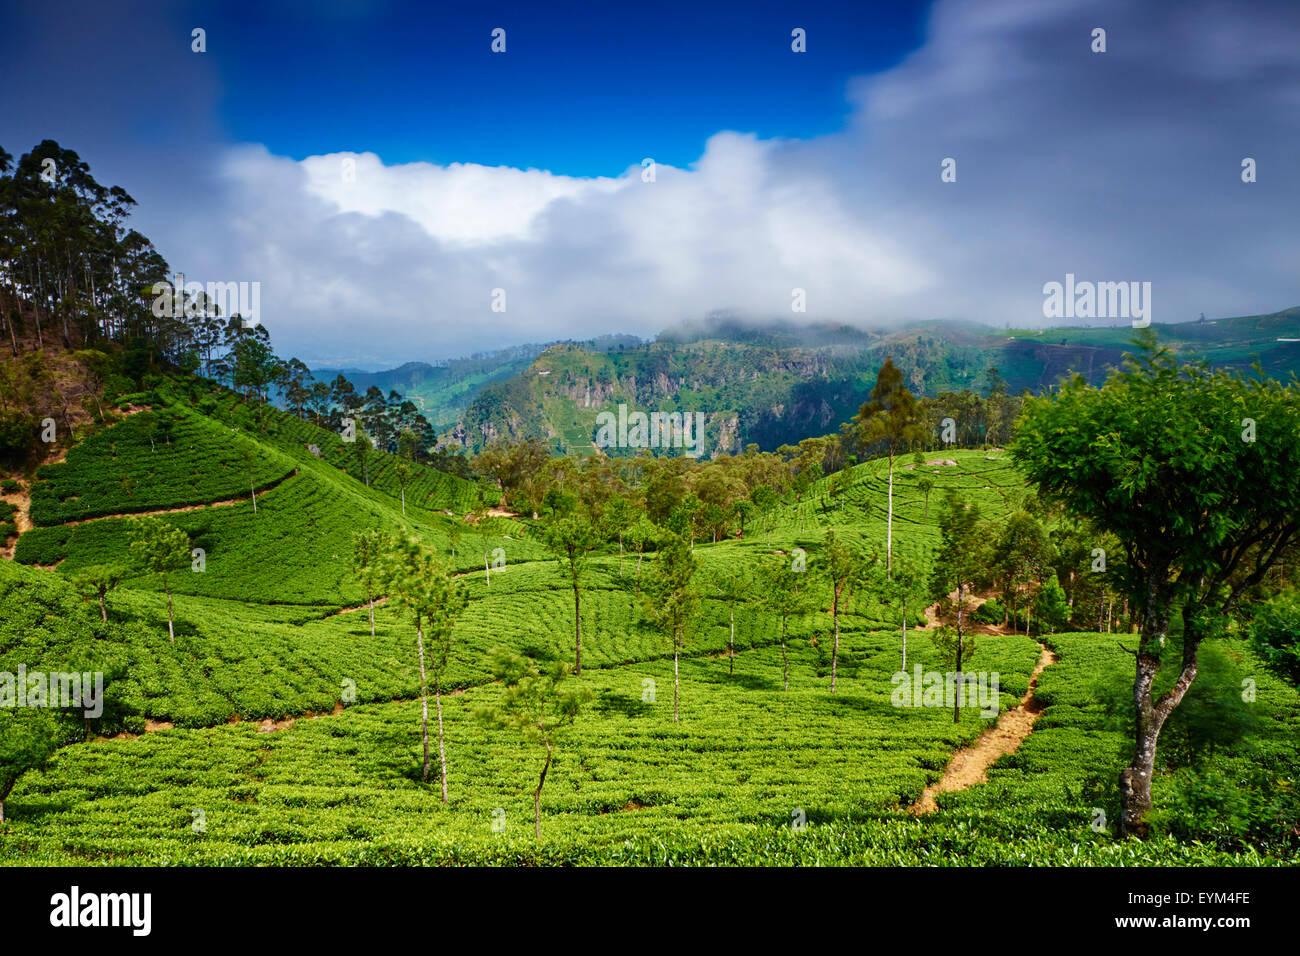 Sri Lanka, Ceylon, Central Province, Haputale, tea plantation in the Highlands, Lipton's seat - Stock Image